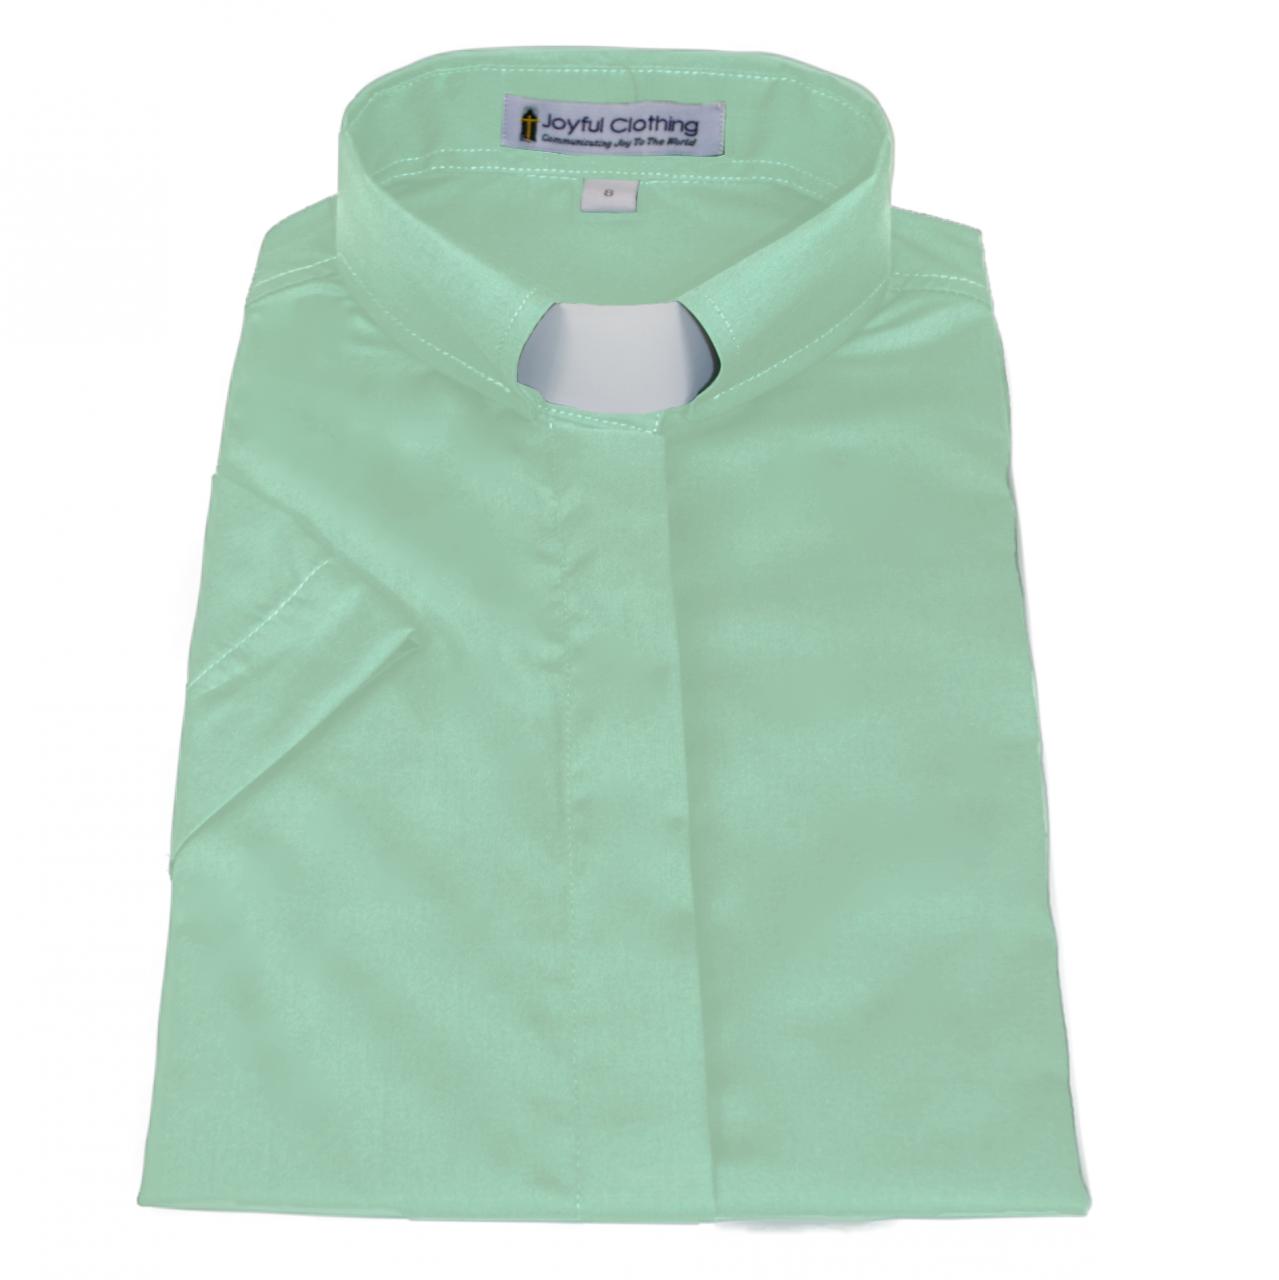 568. Women's Short-Sleeve Tab-Collar Clergy Shirt - Mint Green